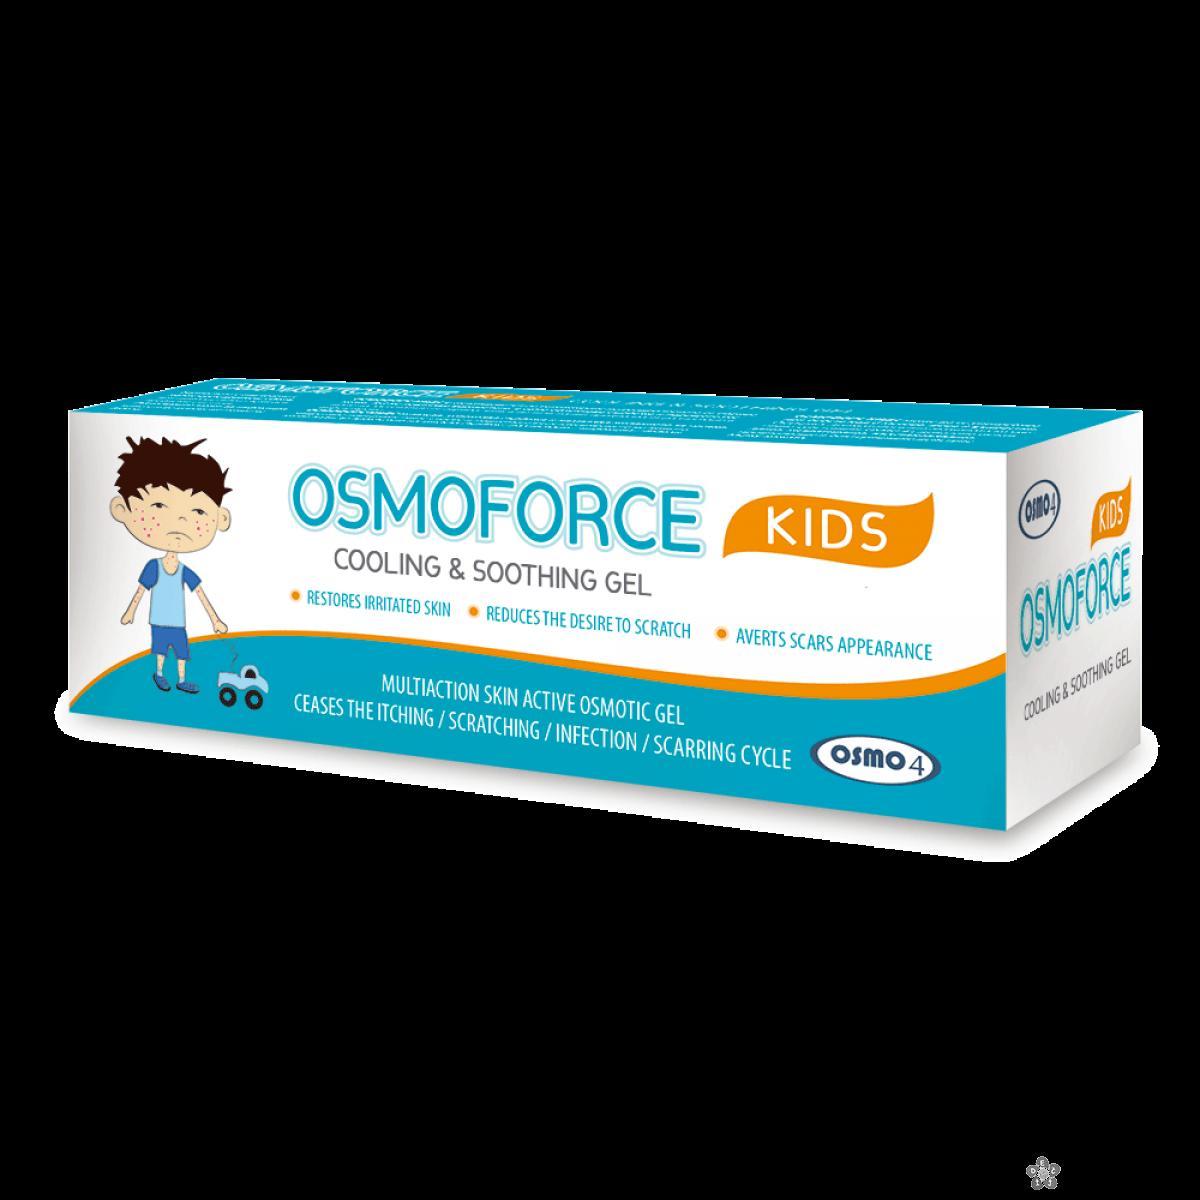 Osmoforce - vodeni gel za hlađenje